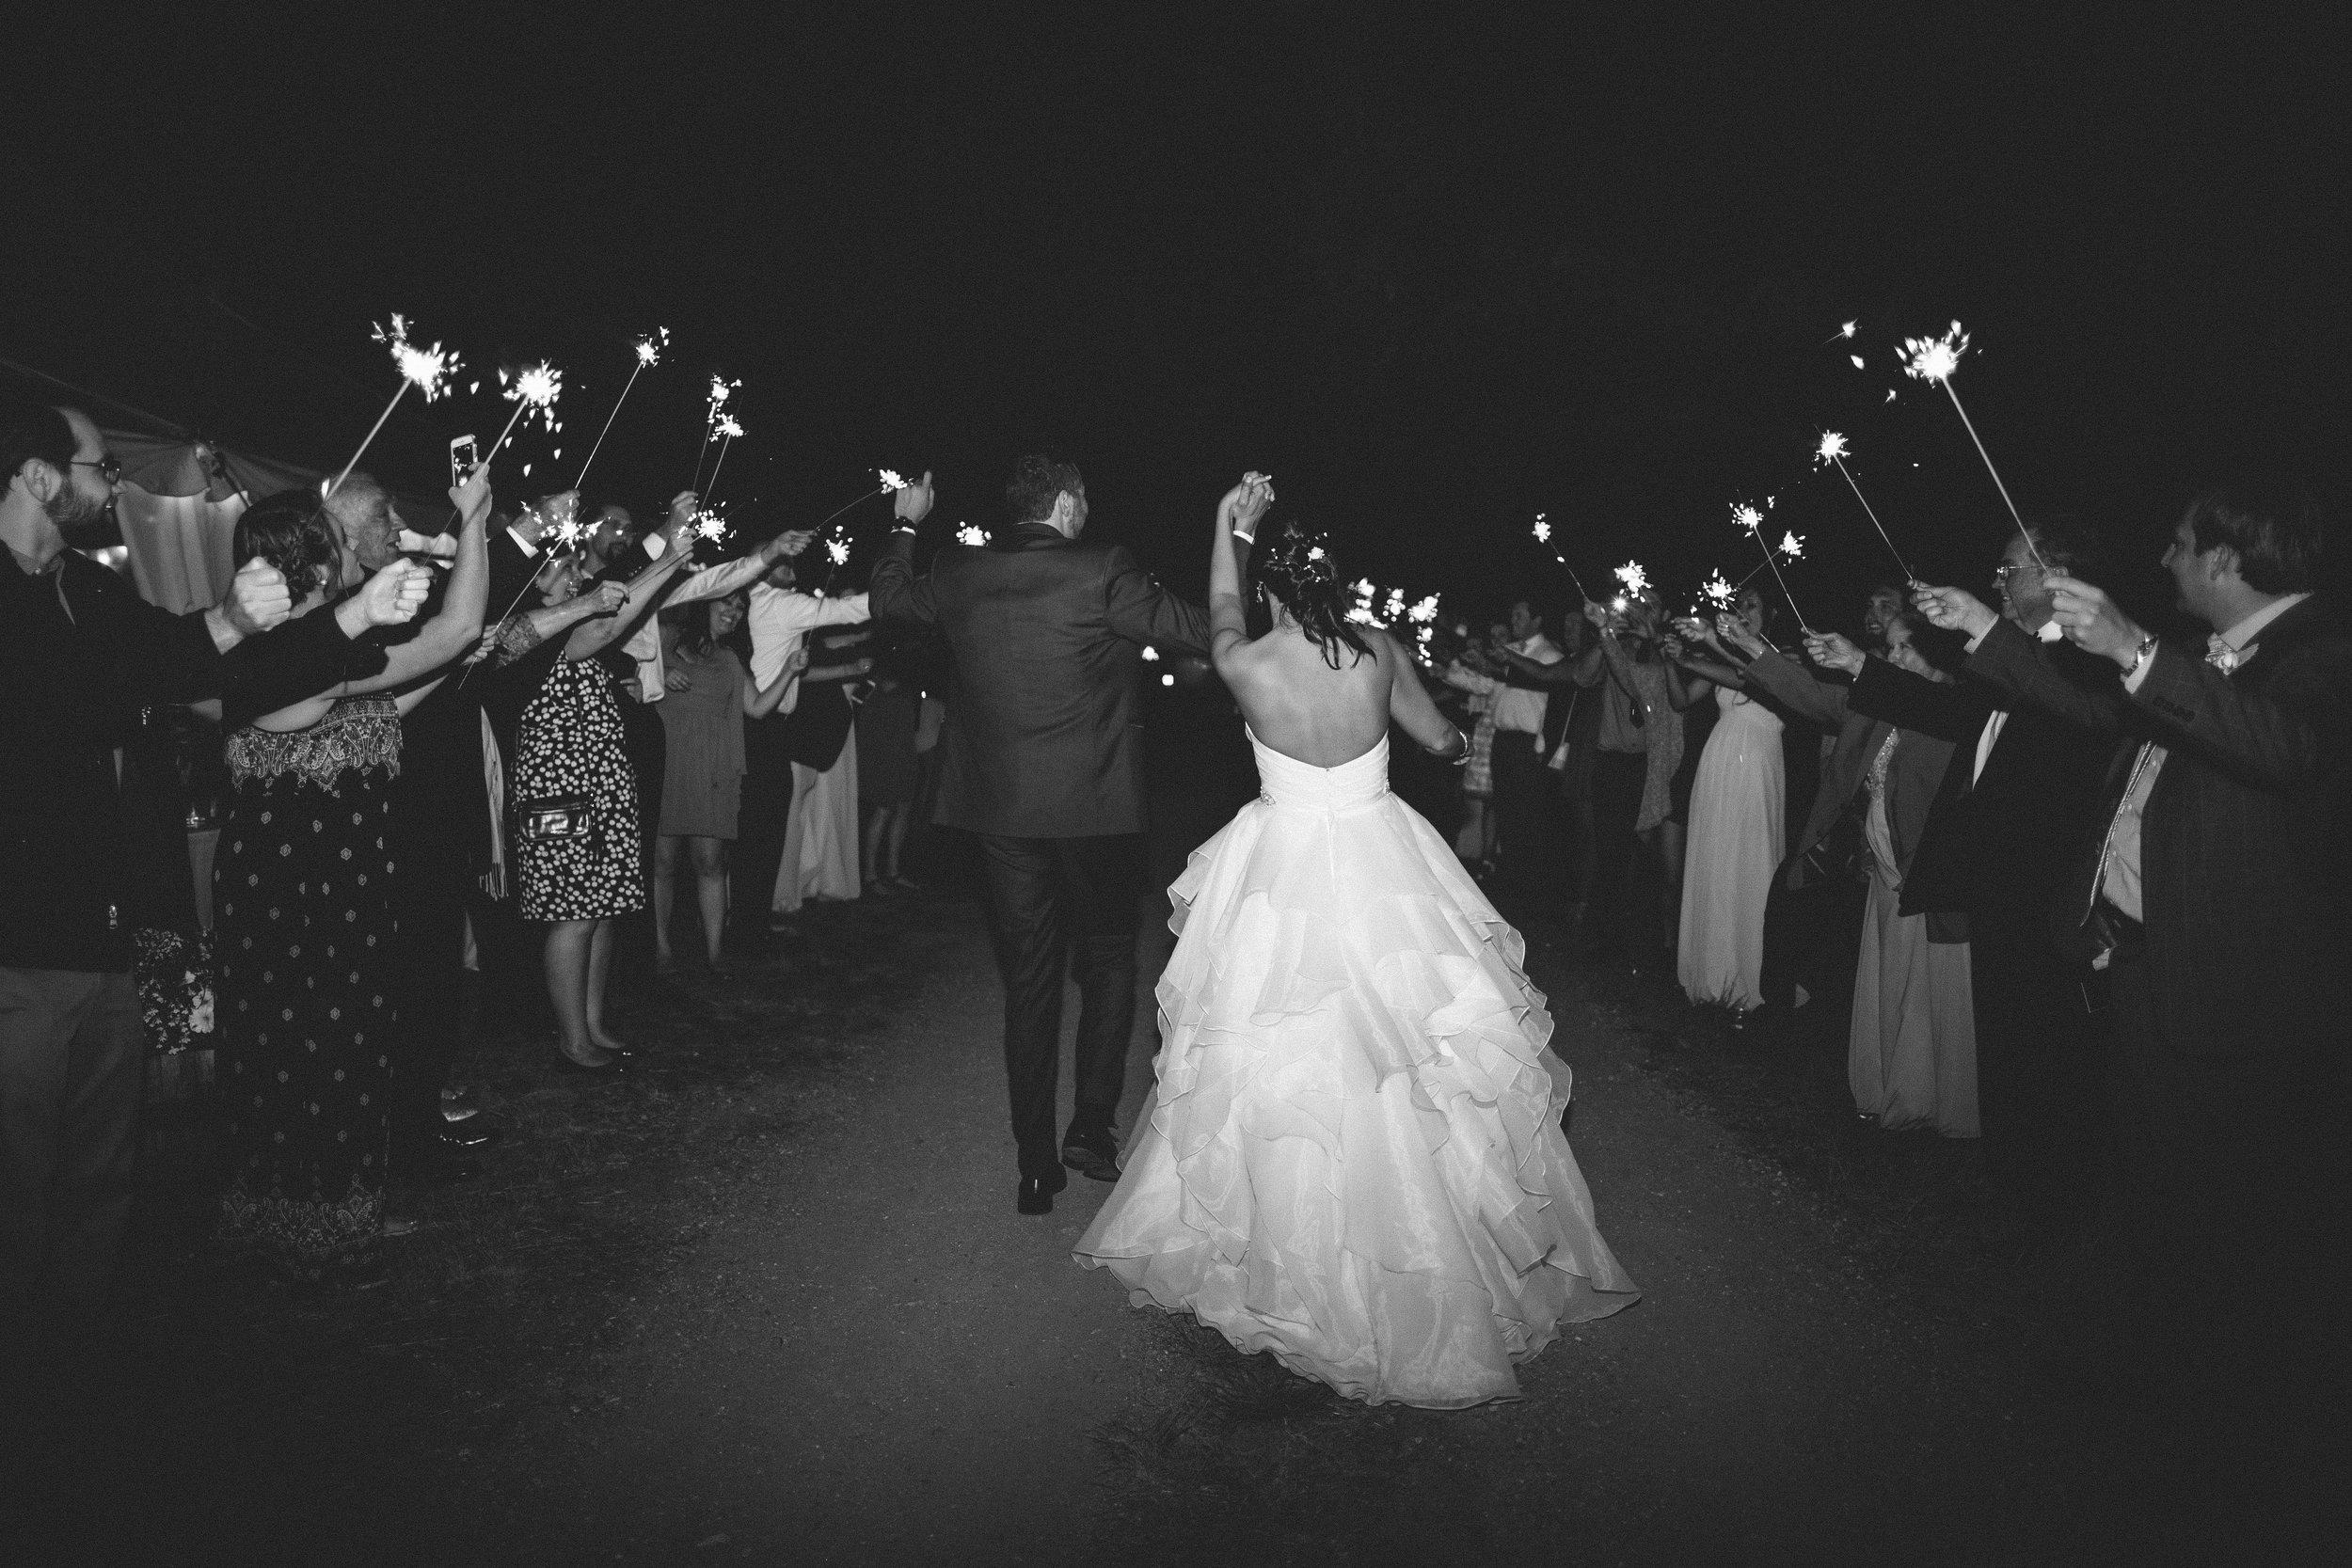 MP_16.06.19_Michael-&-Brittany-Wedding-7436.jpg